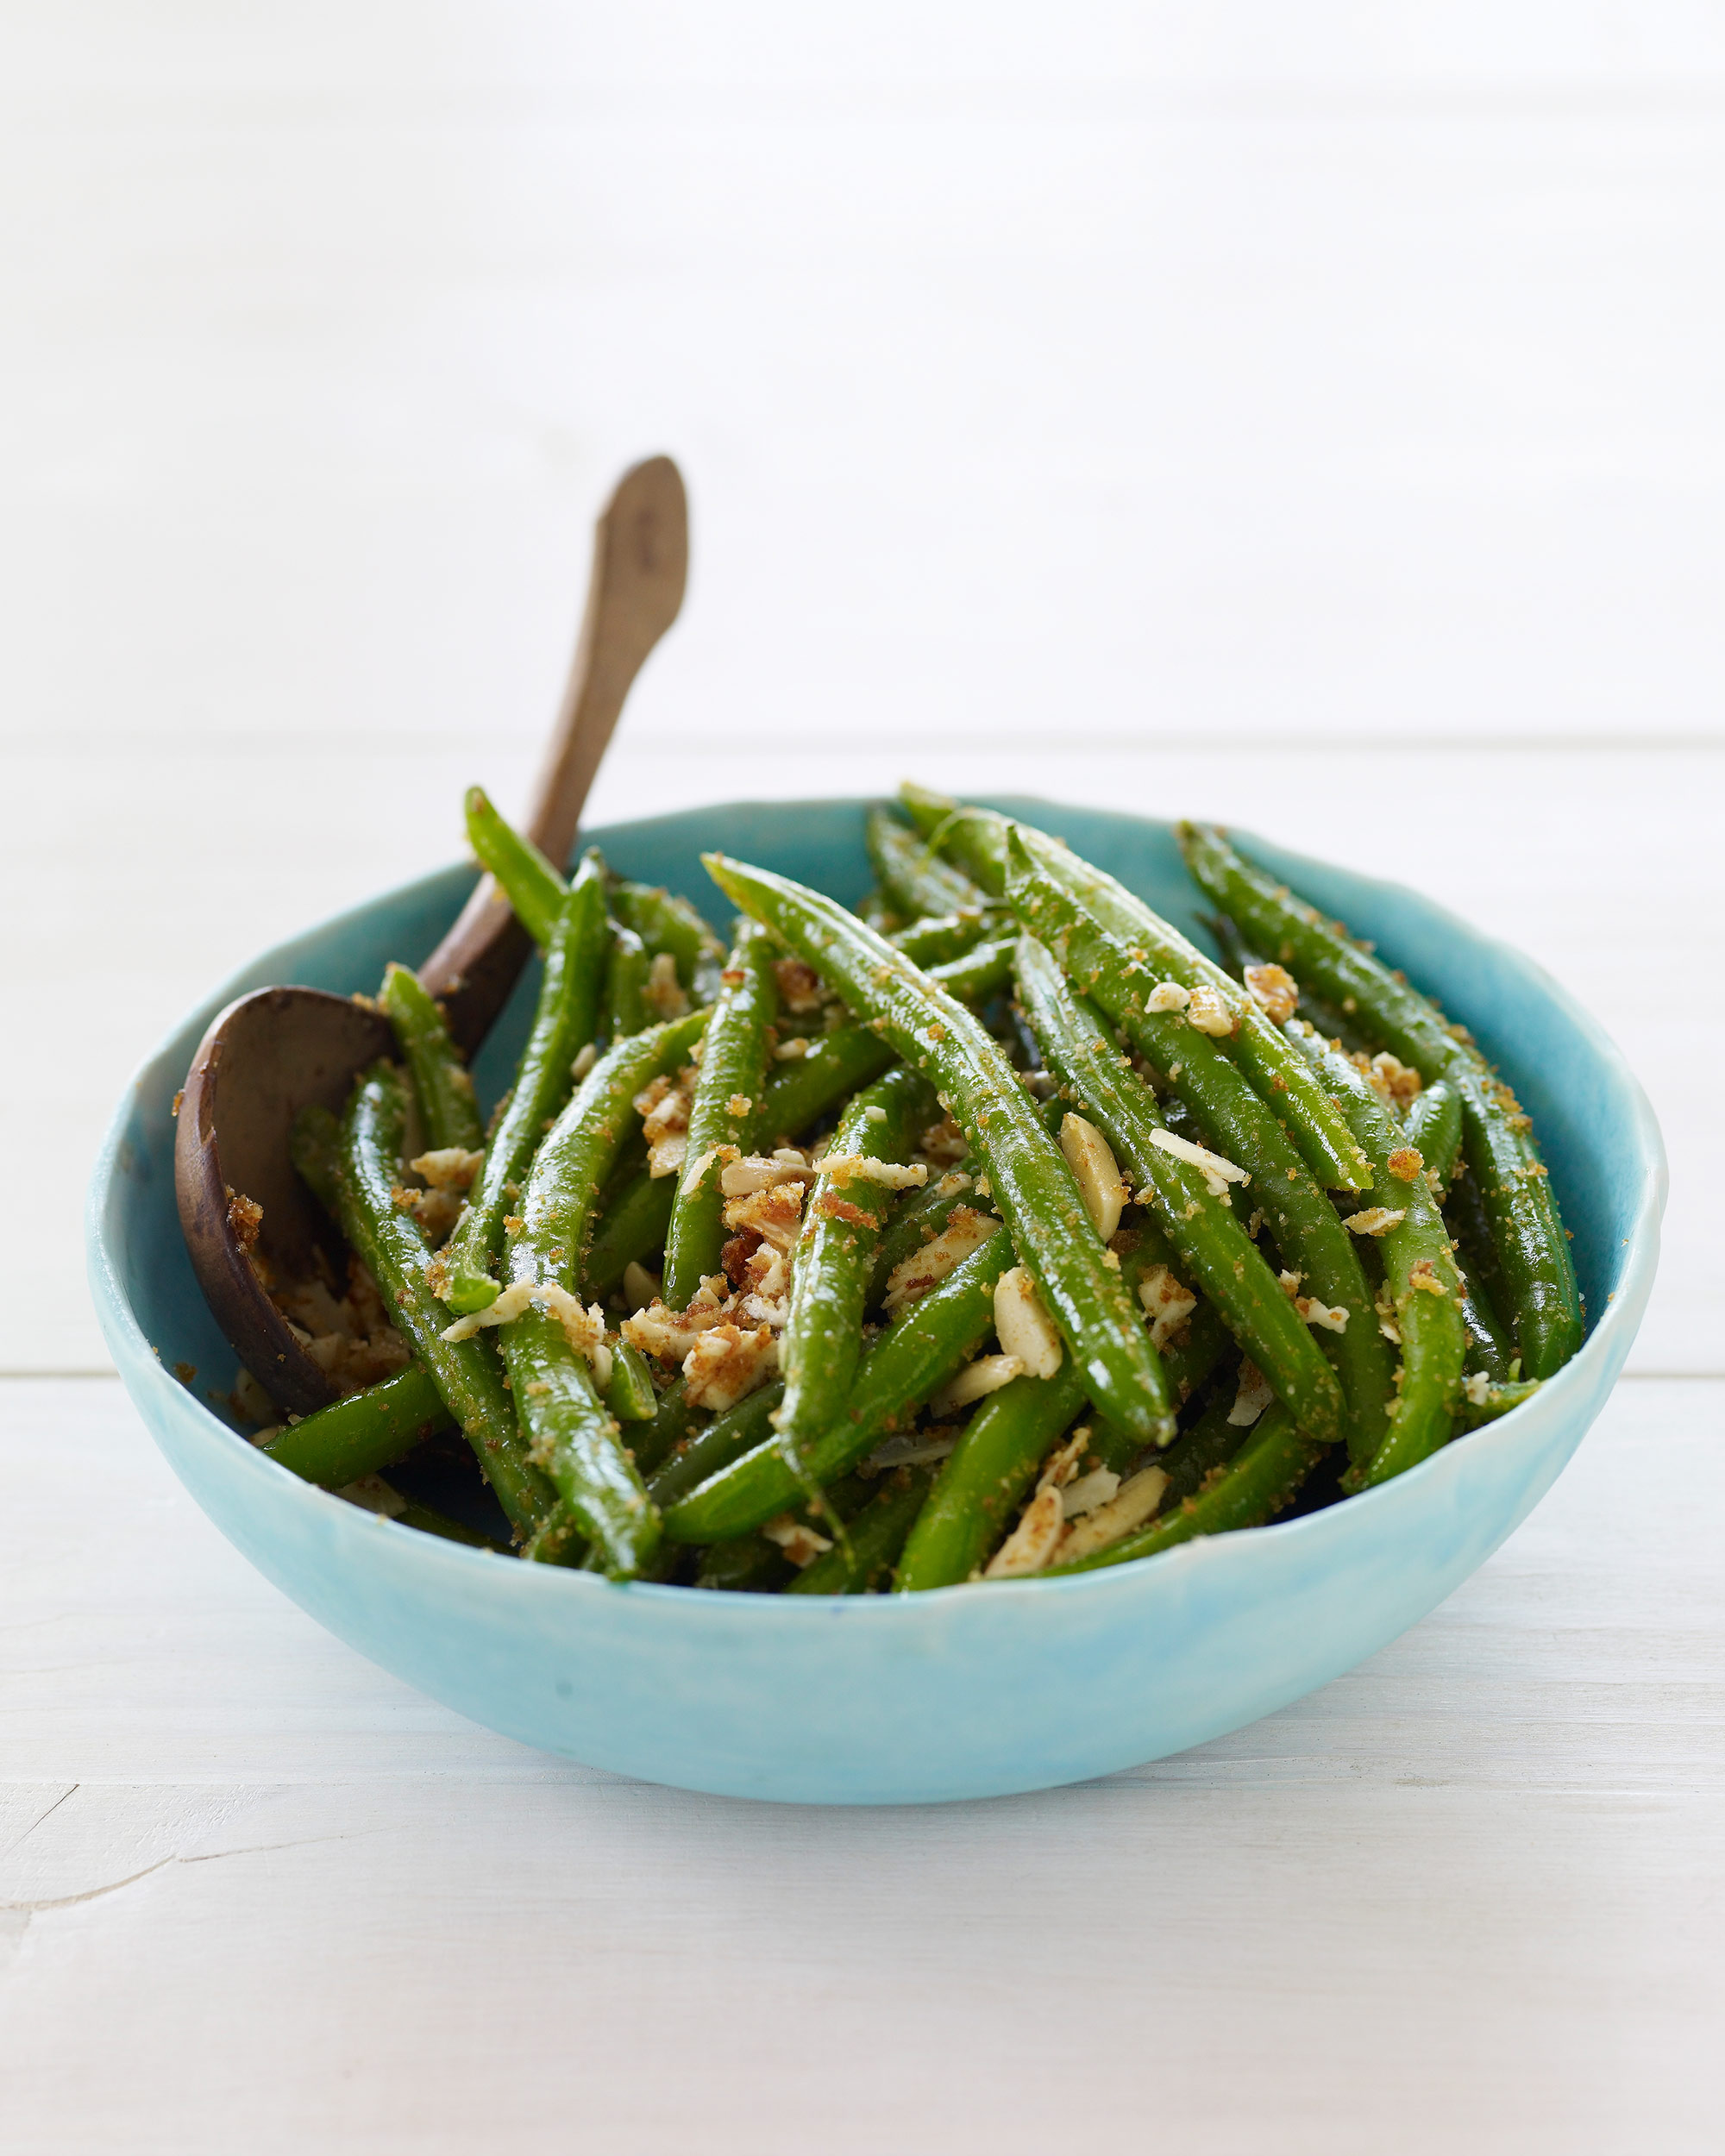 Seafood_Siciliana_Green_Beans_MollyFitzsimons_PropStylist.jpg